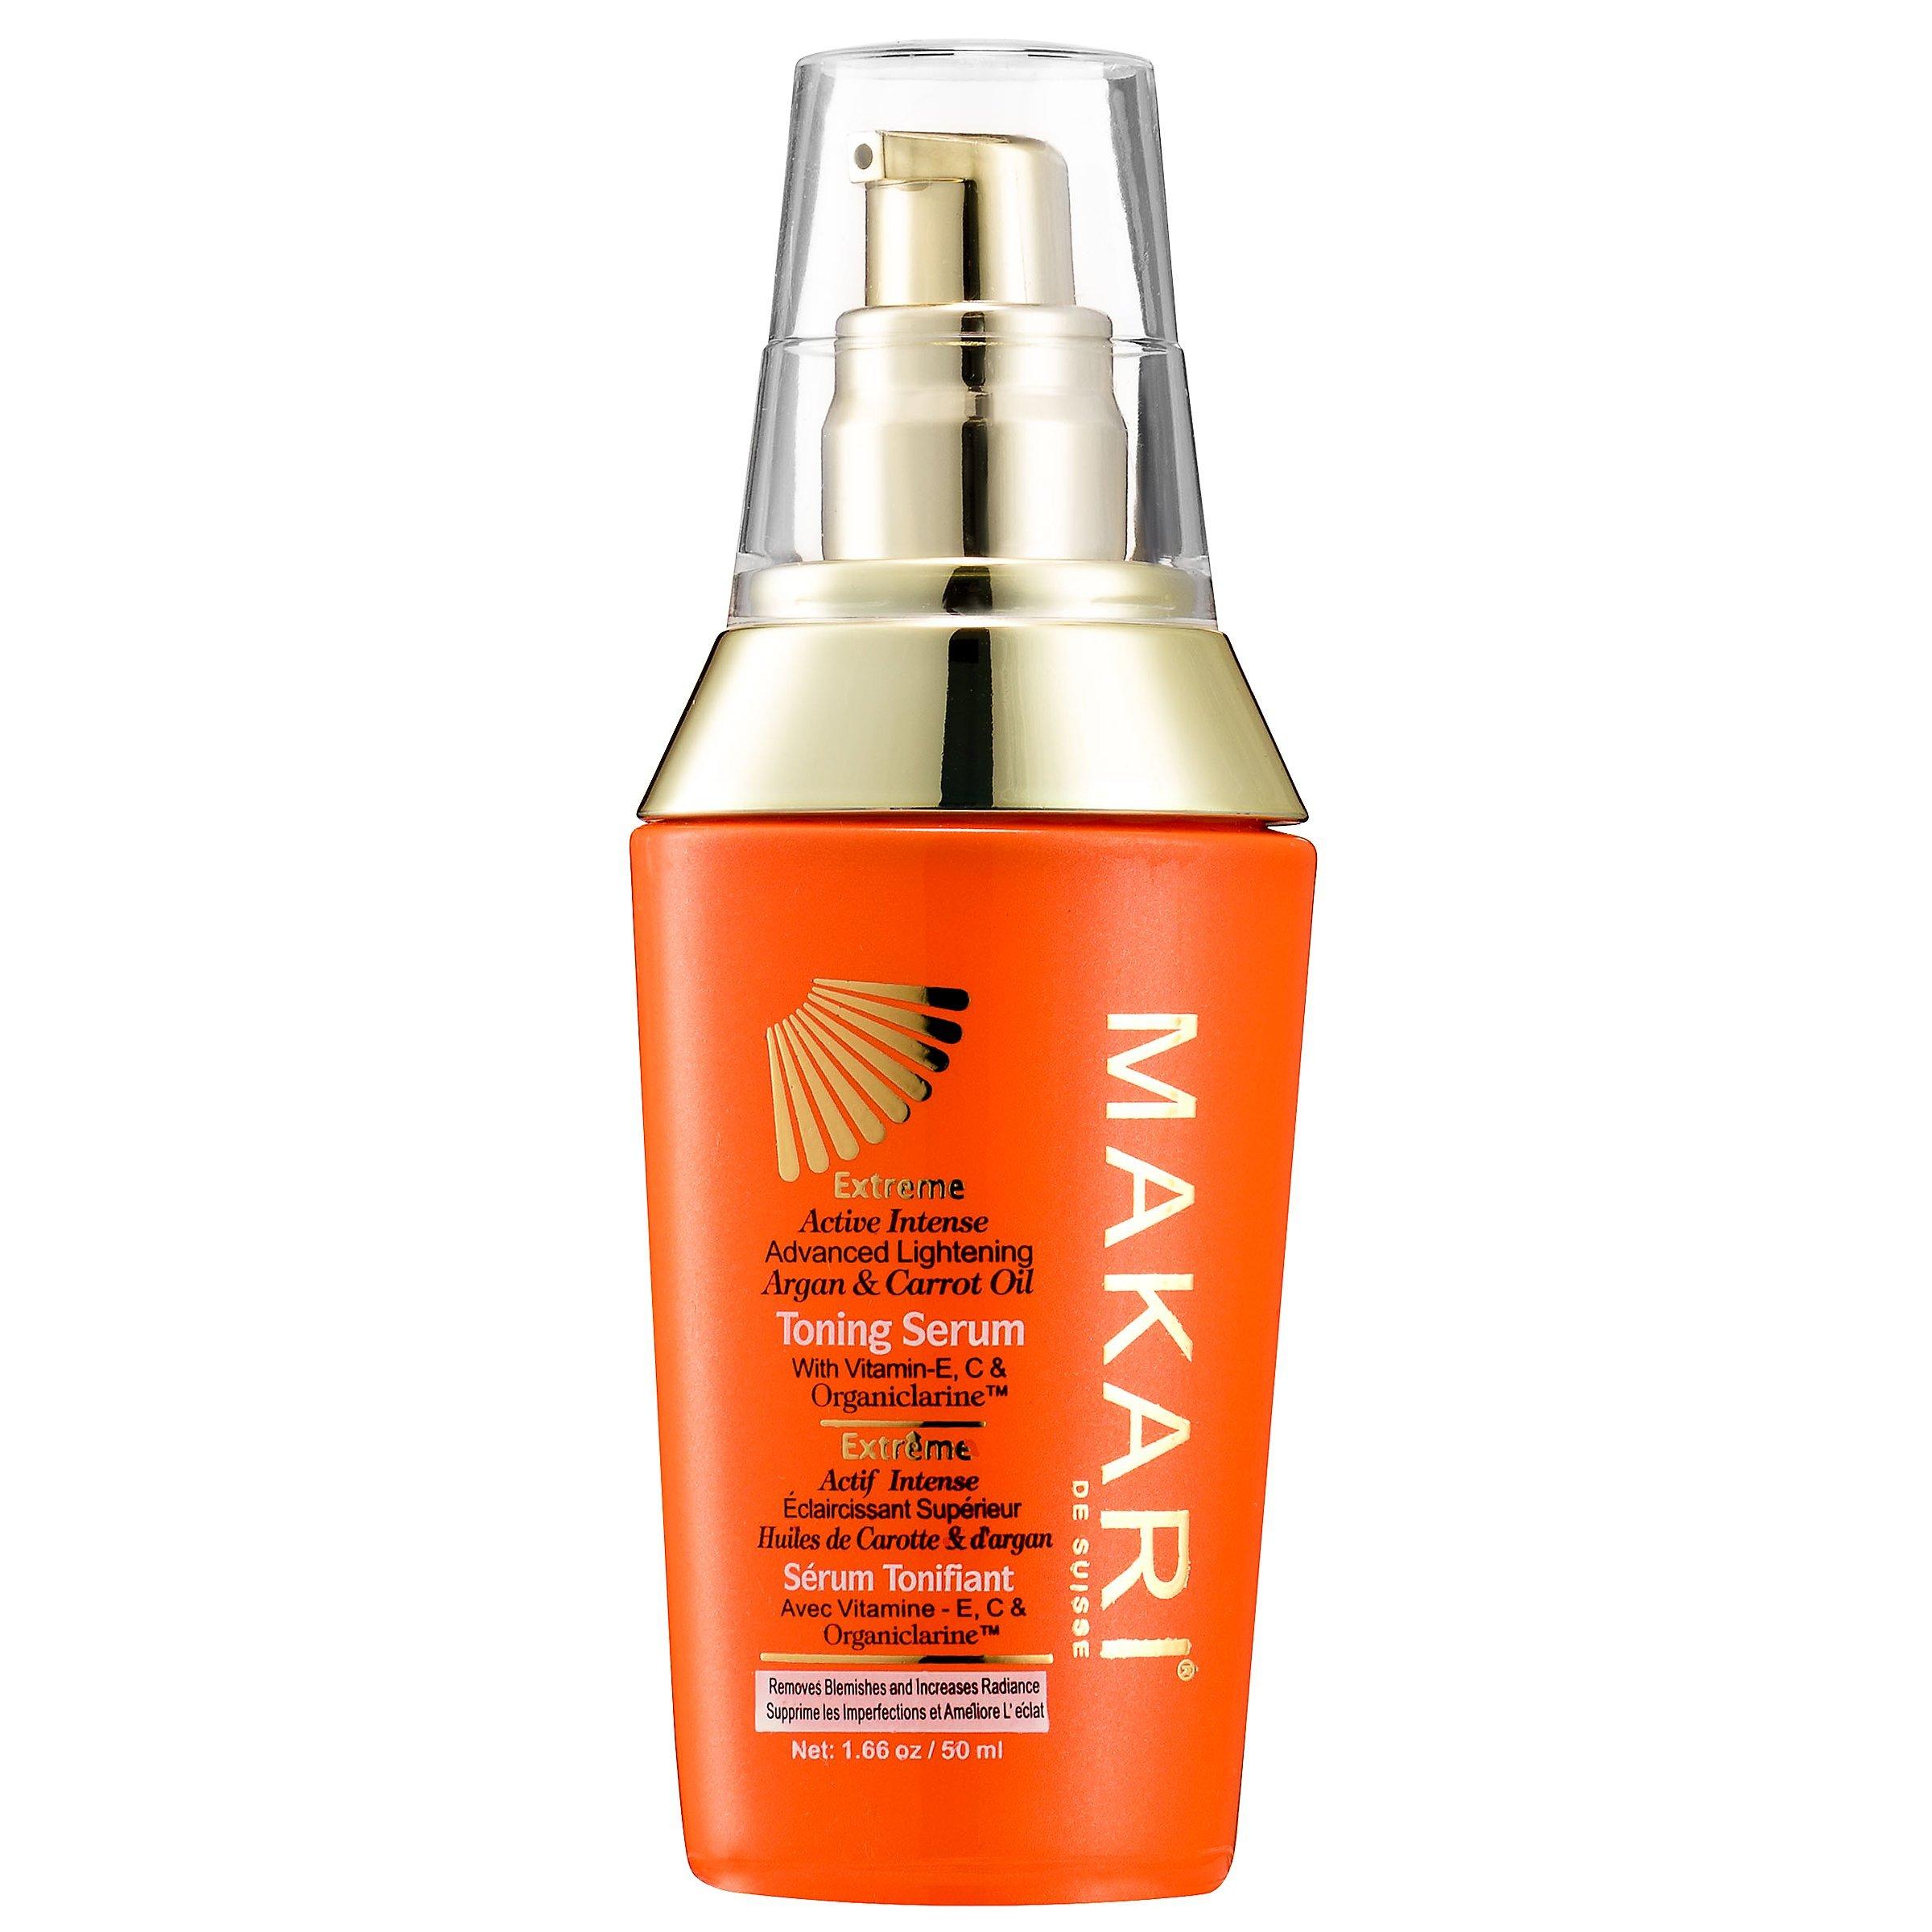 Makari Extreme Carrot & Argan Oil Skin Toning Serum 1.7oz – Lightening, Brightening & Tightening Body Serum with Organiclarine – Whitening & Anti-Aging Treatment for Dark Spots, Acne Scars